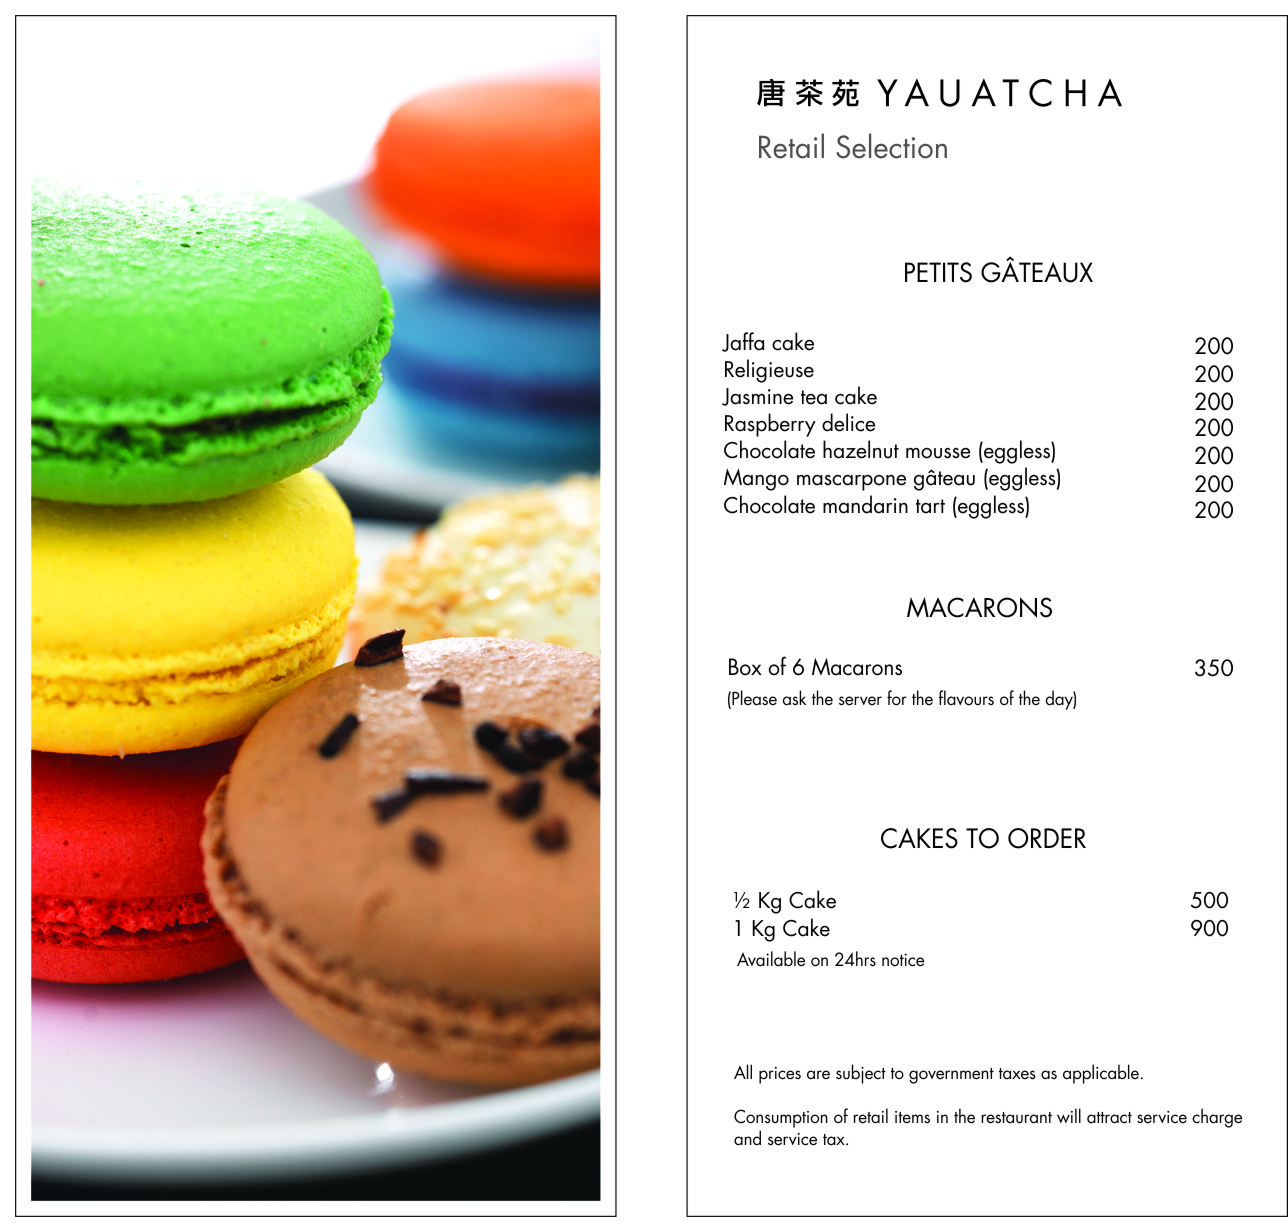 Yauatcha Retail Menu_Web.jpg